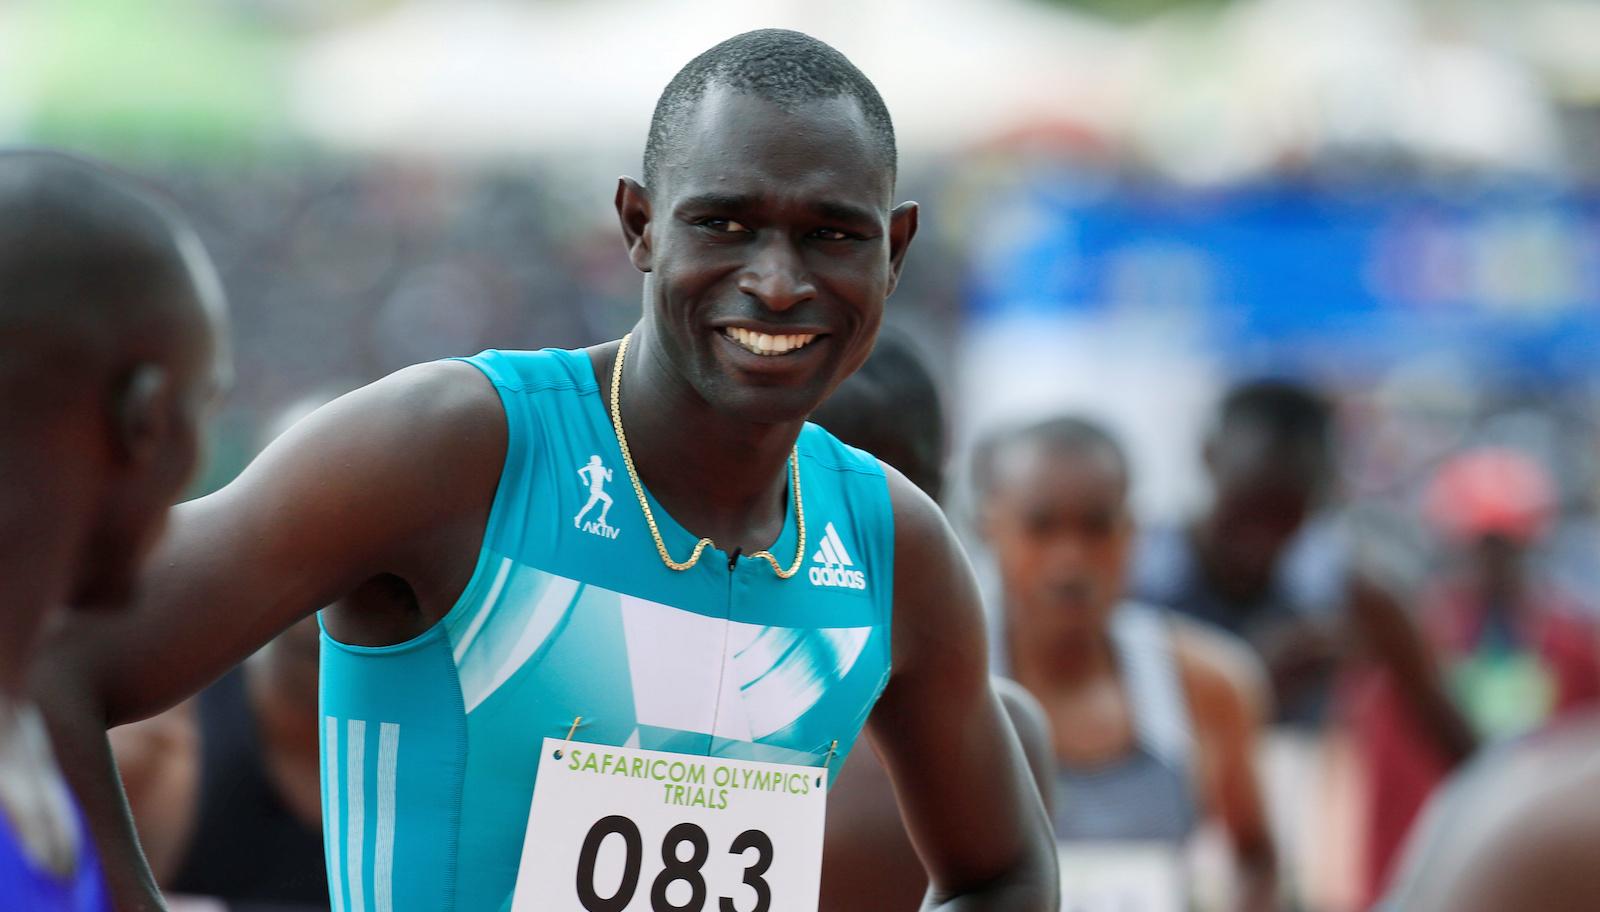 Athletics - Rio 2016 Olympic Games - Kenya trials